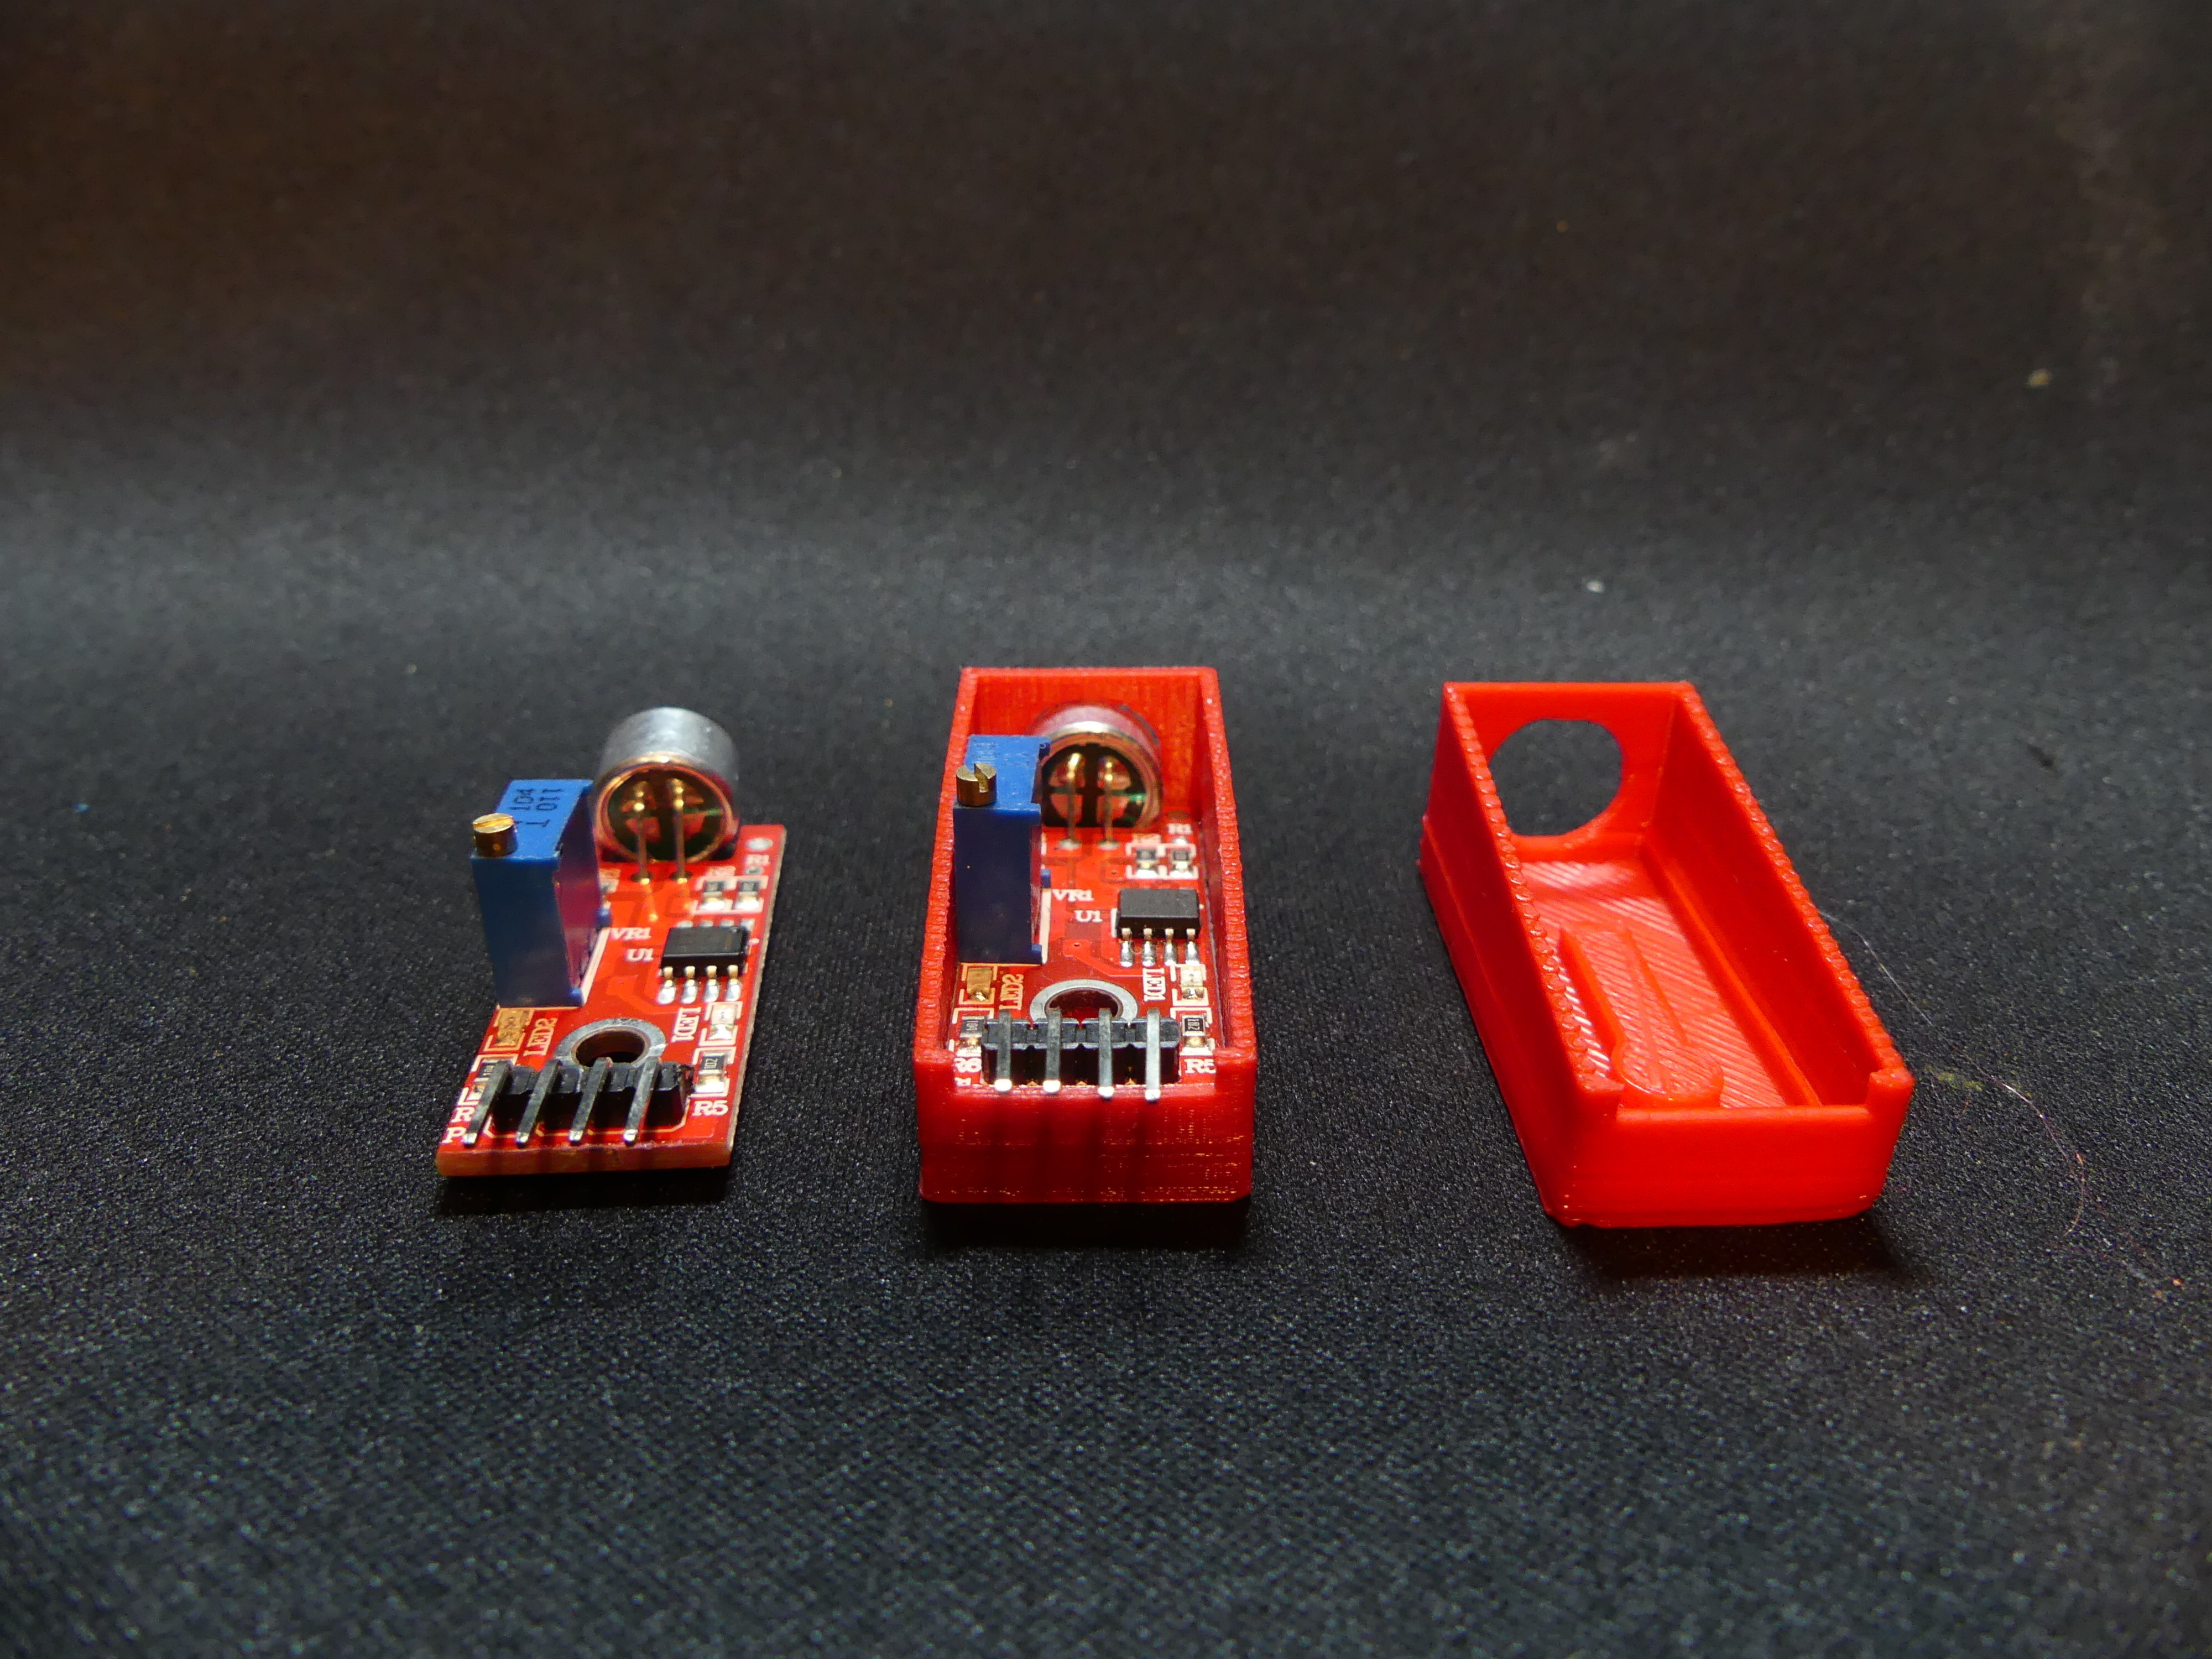 P1140355.JPG Download free STL file Arduino Sound Sensor Bracket • 3D printable template, Linventif